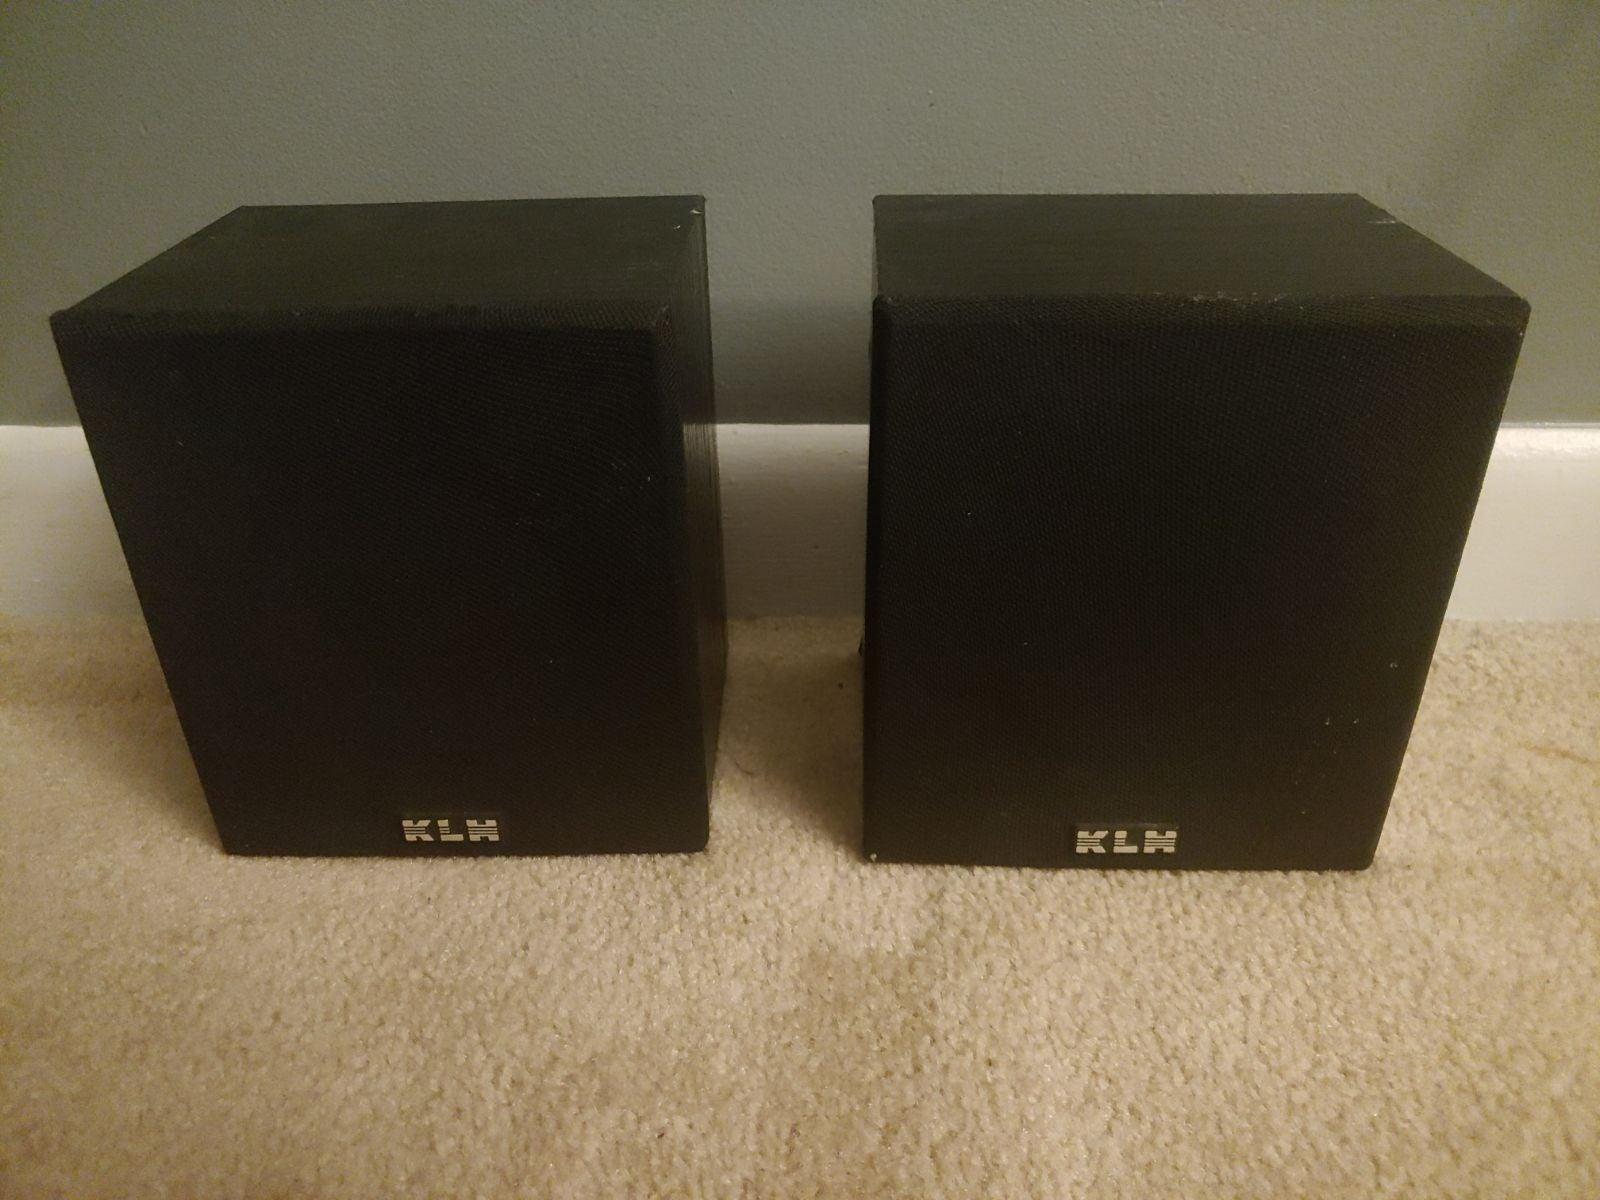 Klh surround speakers.